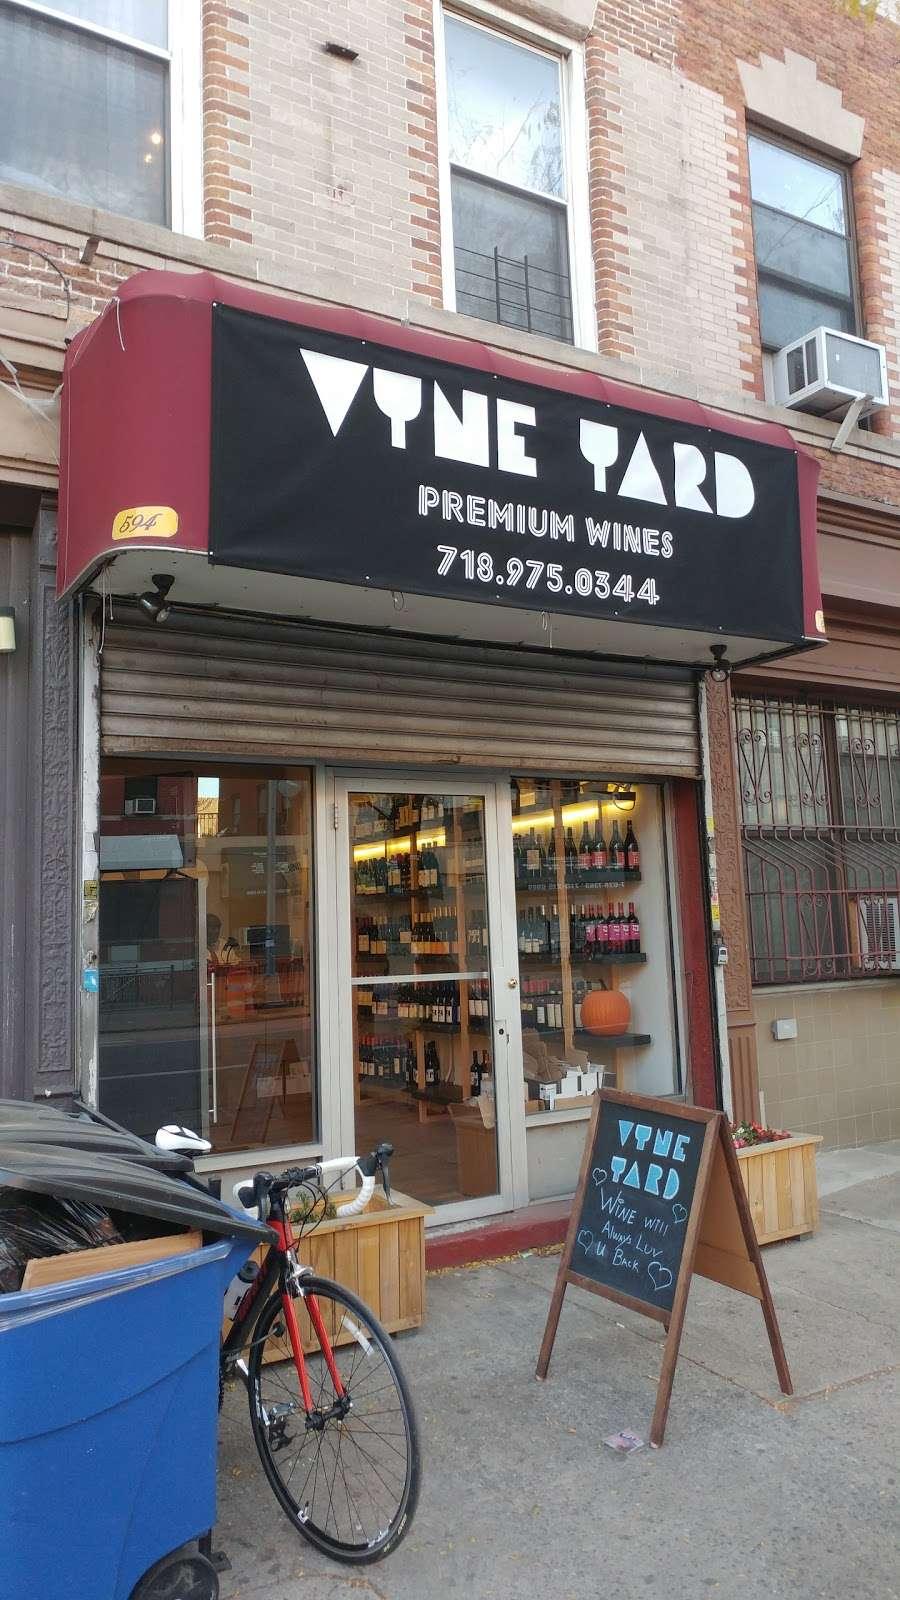 Vyne Yard Wine Shop - store  | Photo 1 of 2 | Address: 594 Rogers Ave, Brooklyn, NY 11225, USA | Phone: (718) 975-0344